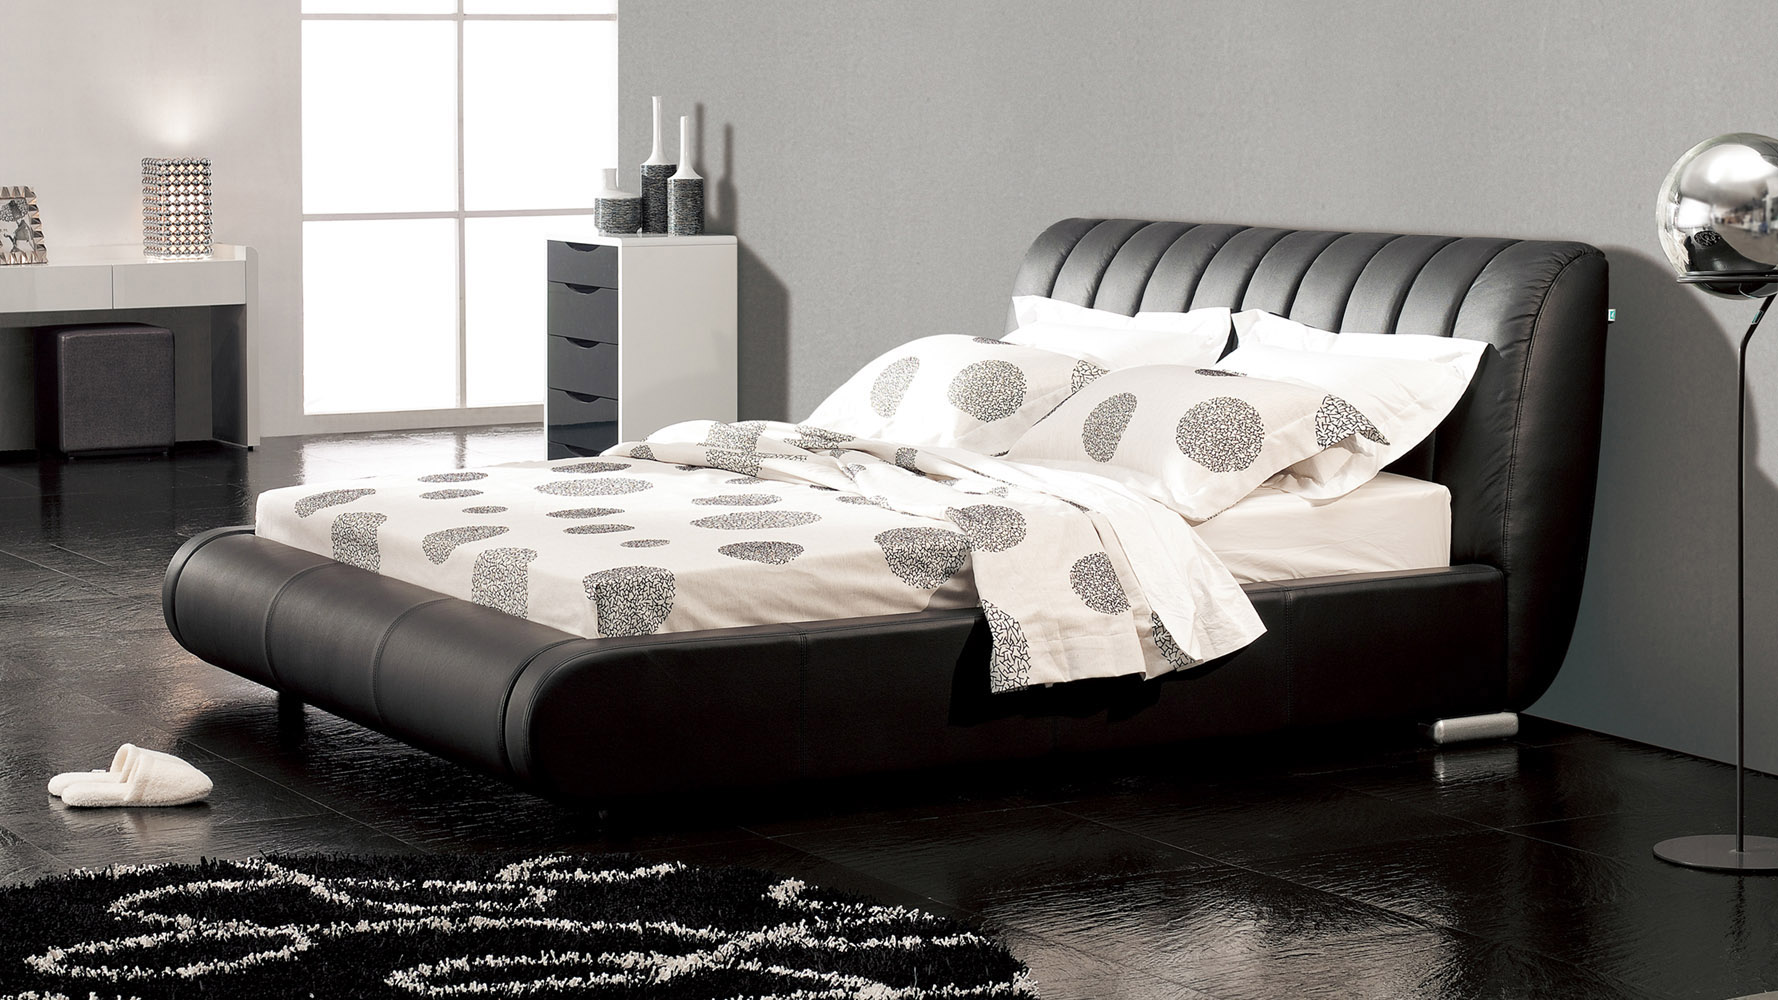 Bedroom Furniture Dubai dior leather contemporary platform bed - black | zuri furniture